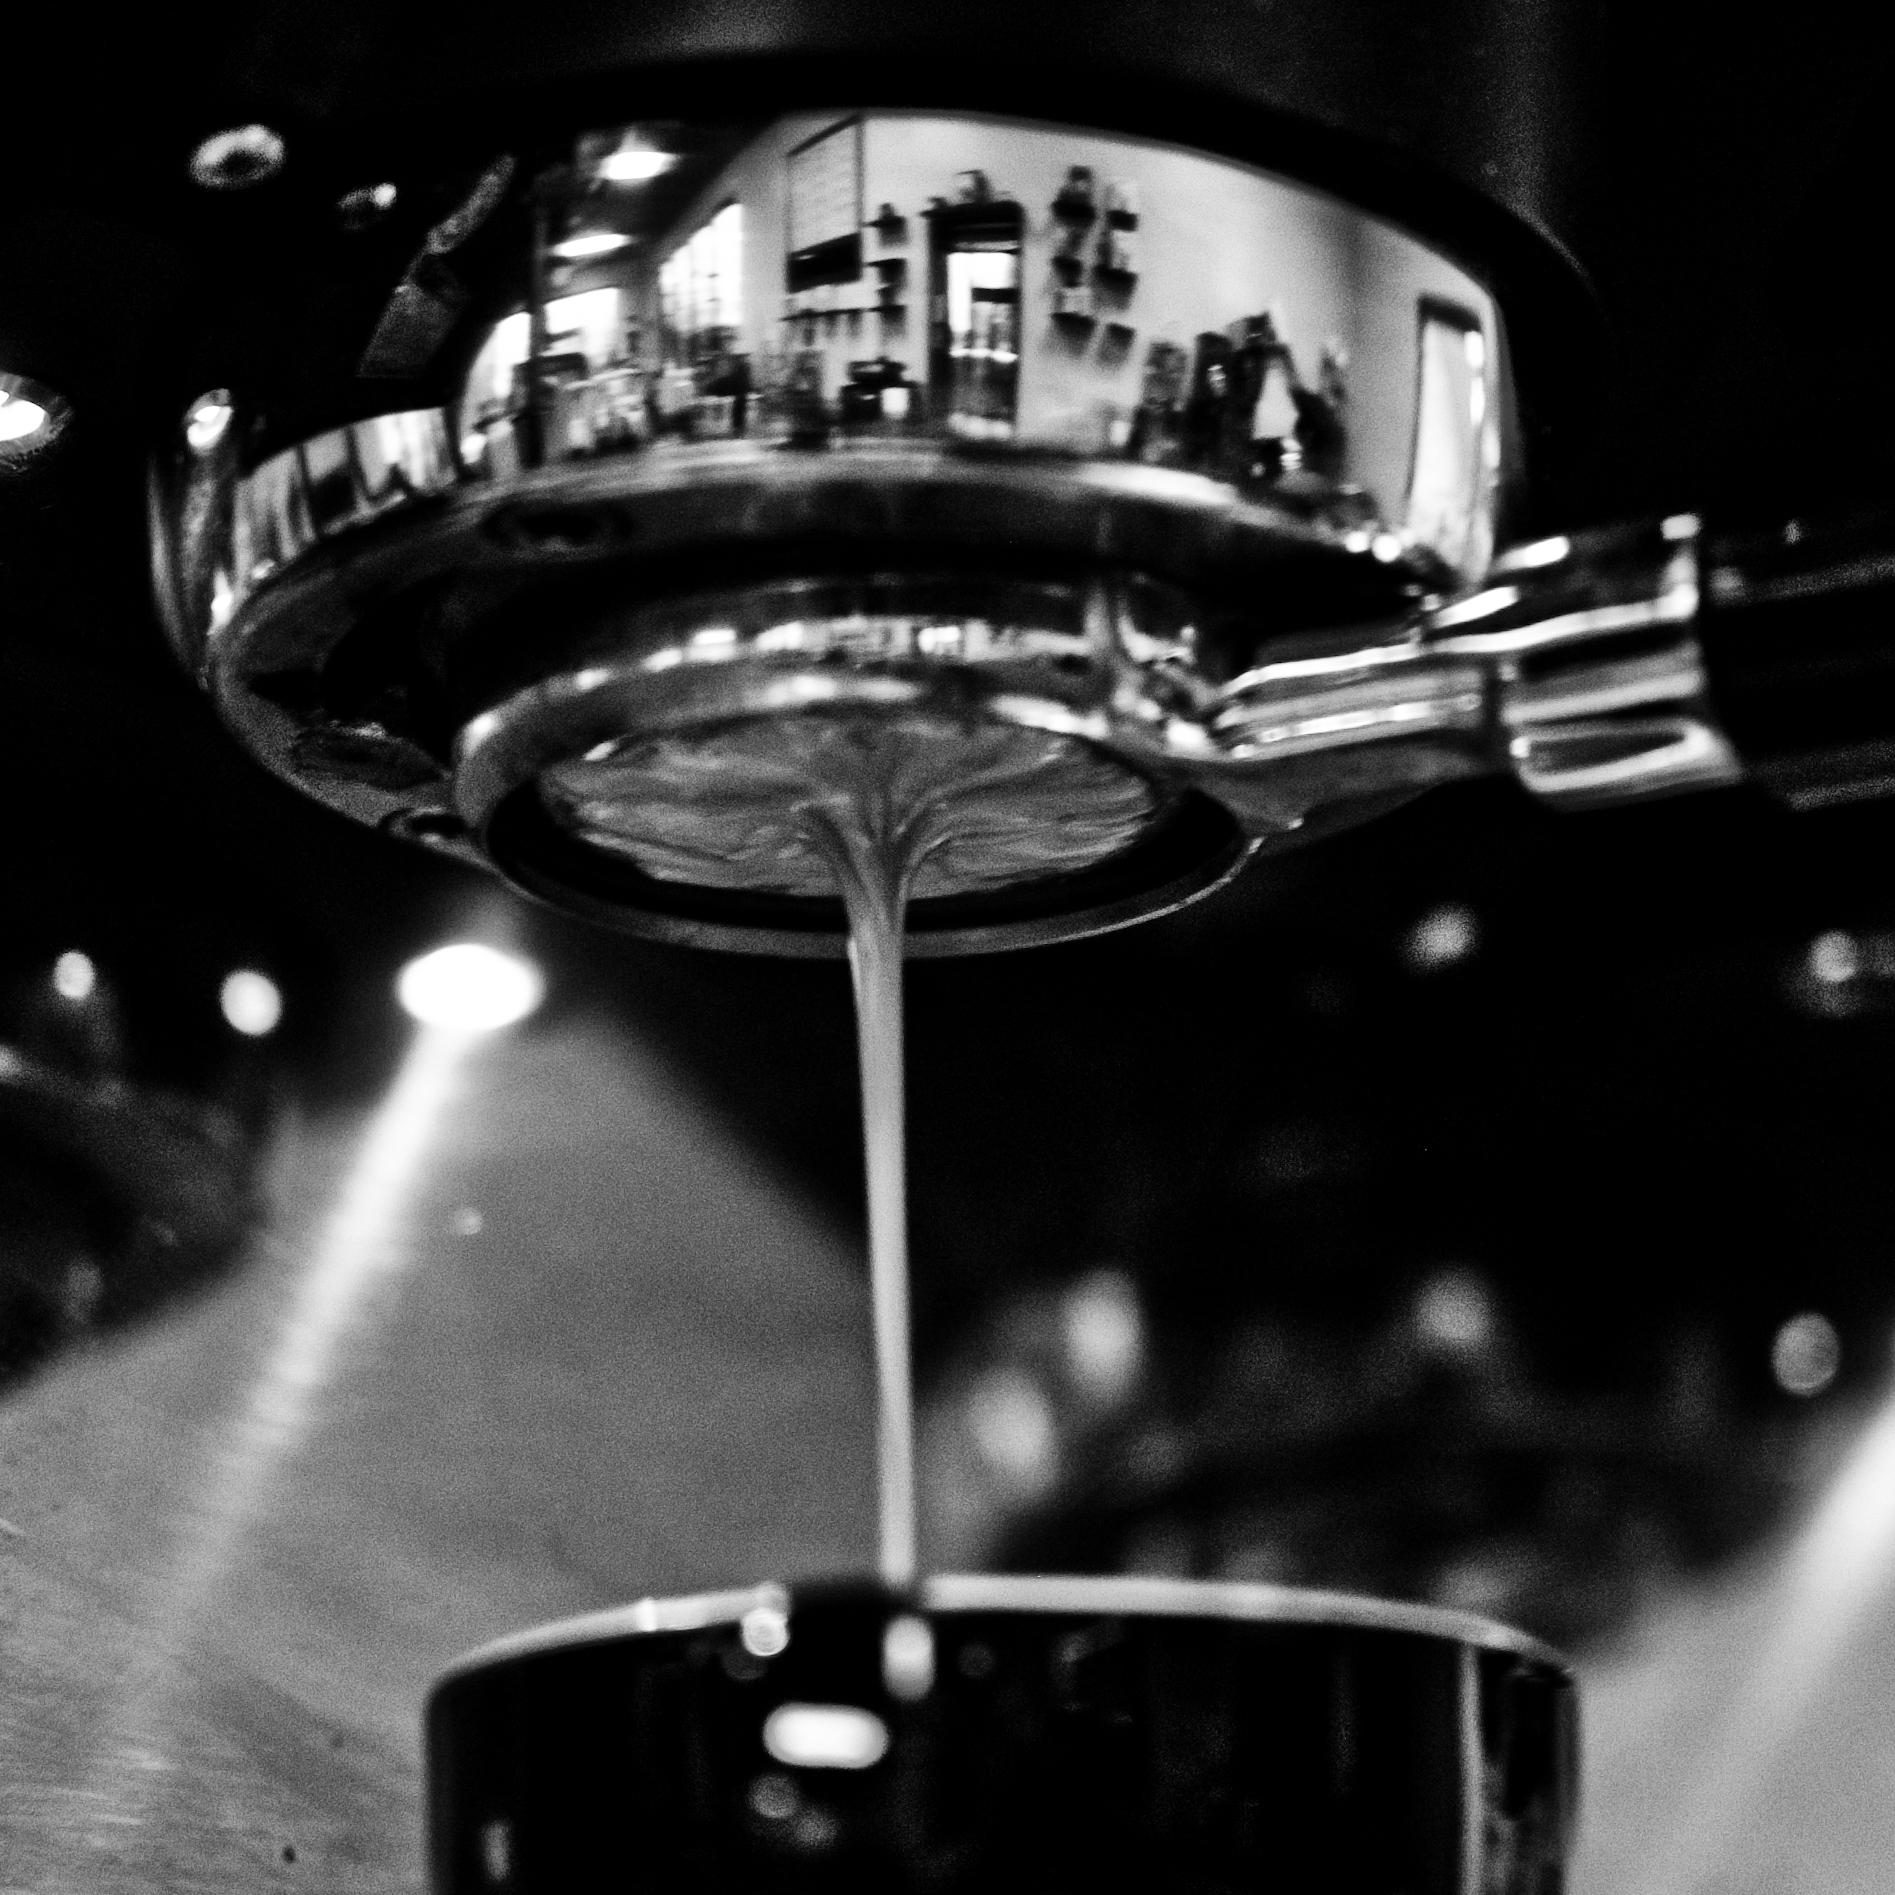 Bottomless portafilter brewing shots of espresso